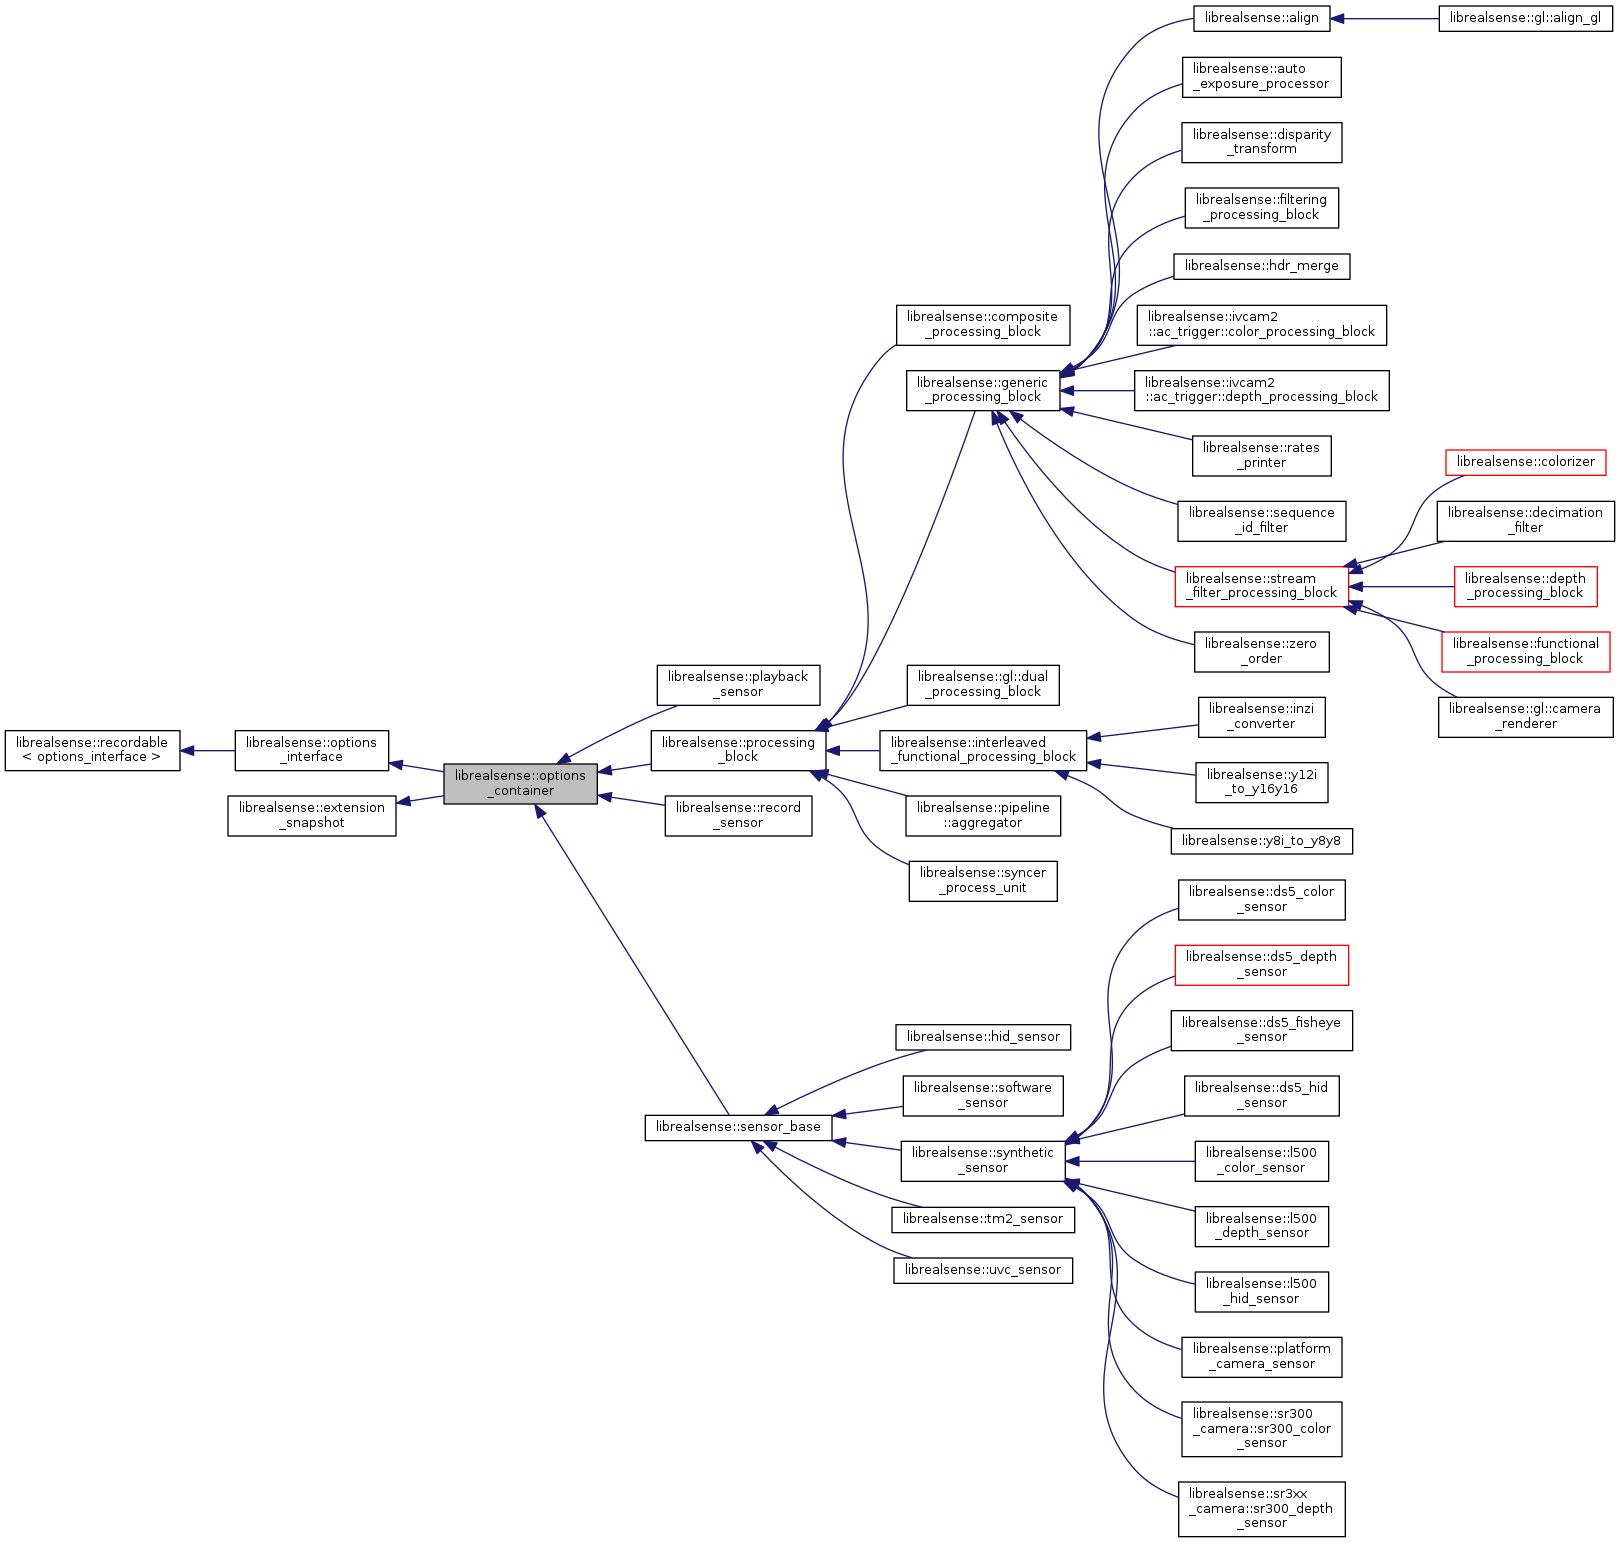 librealsense: librealsense::options_container Class Reference